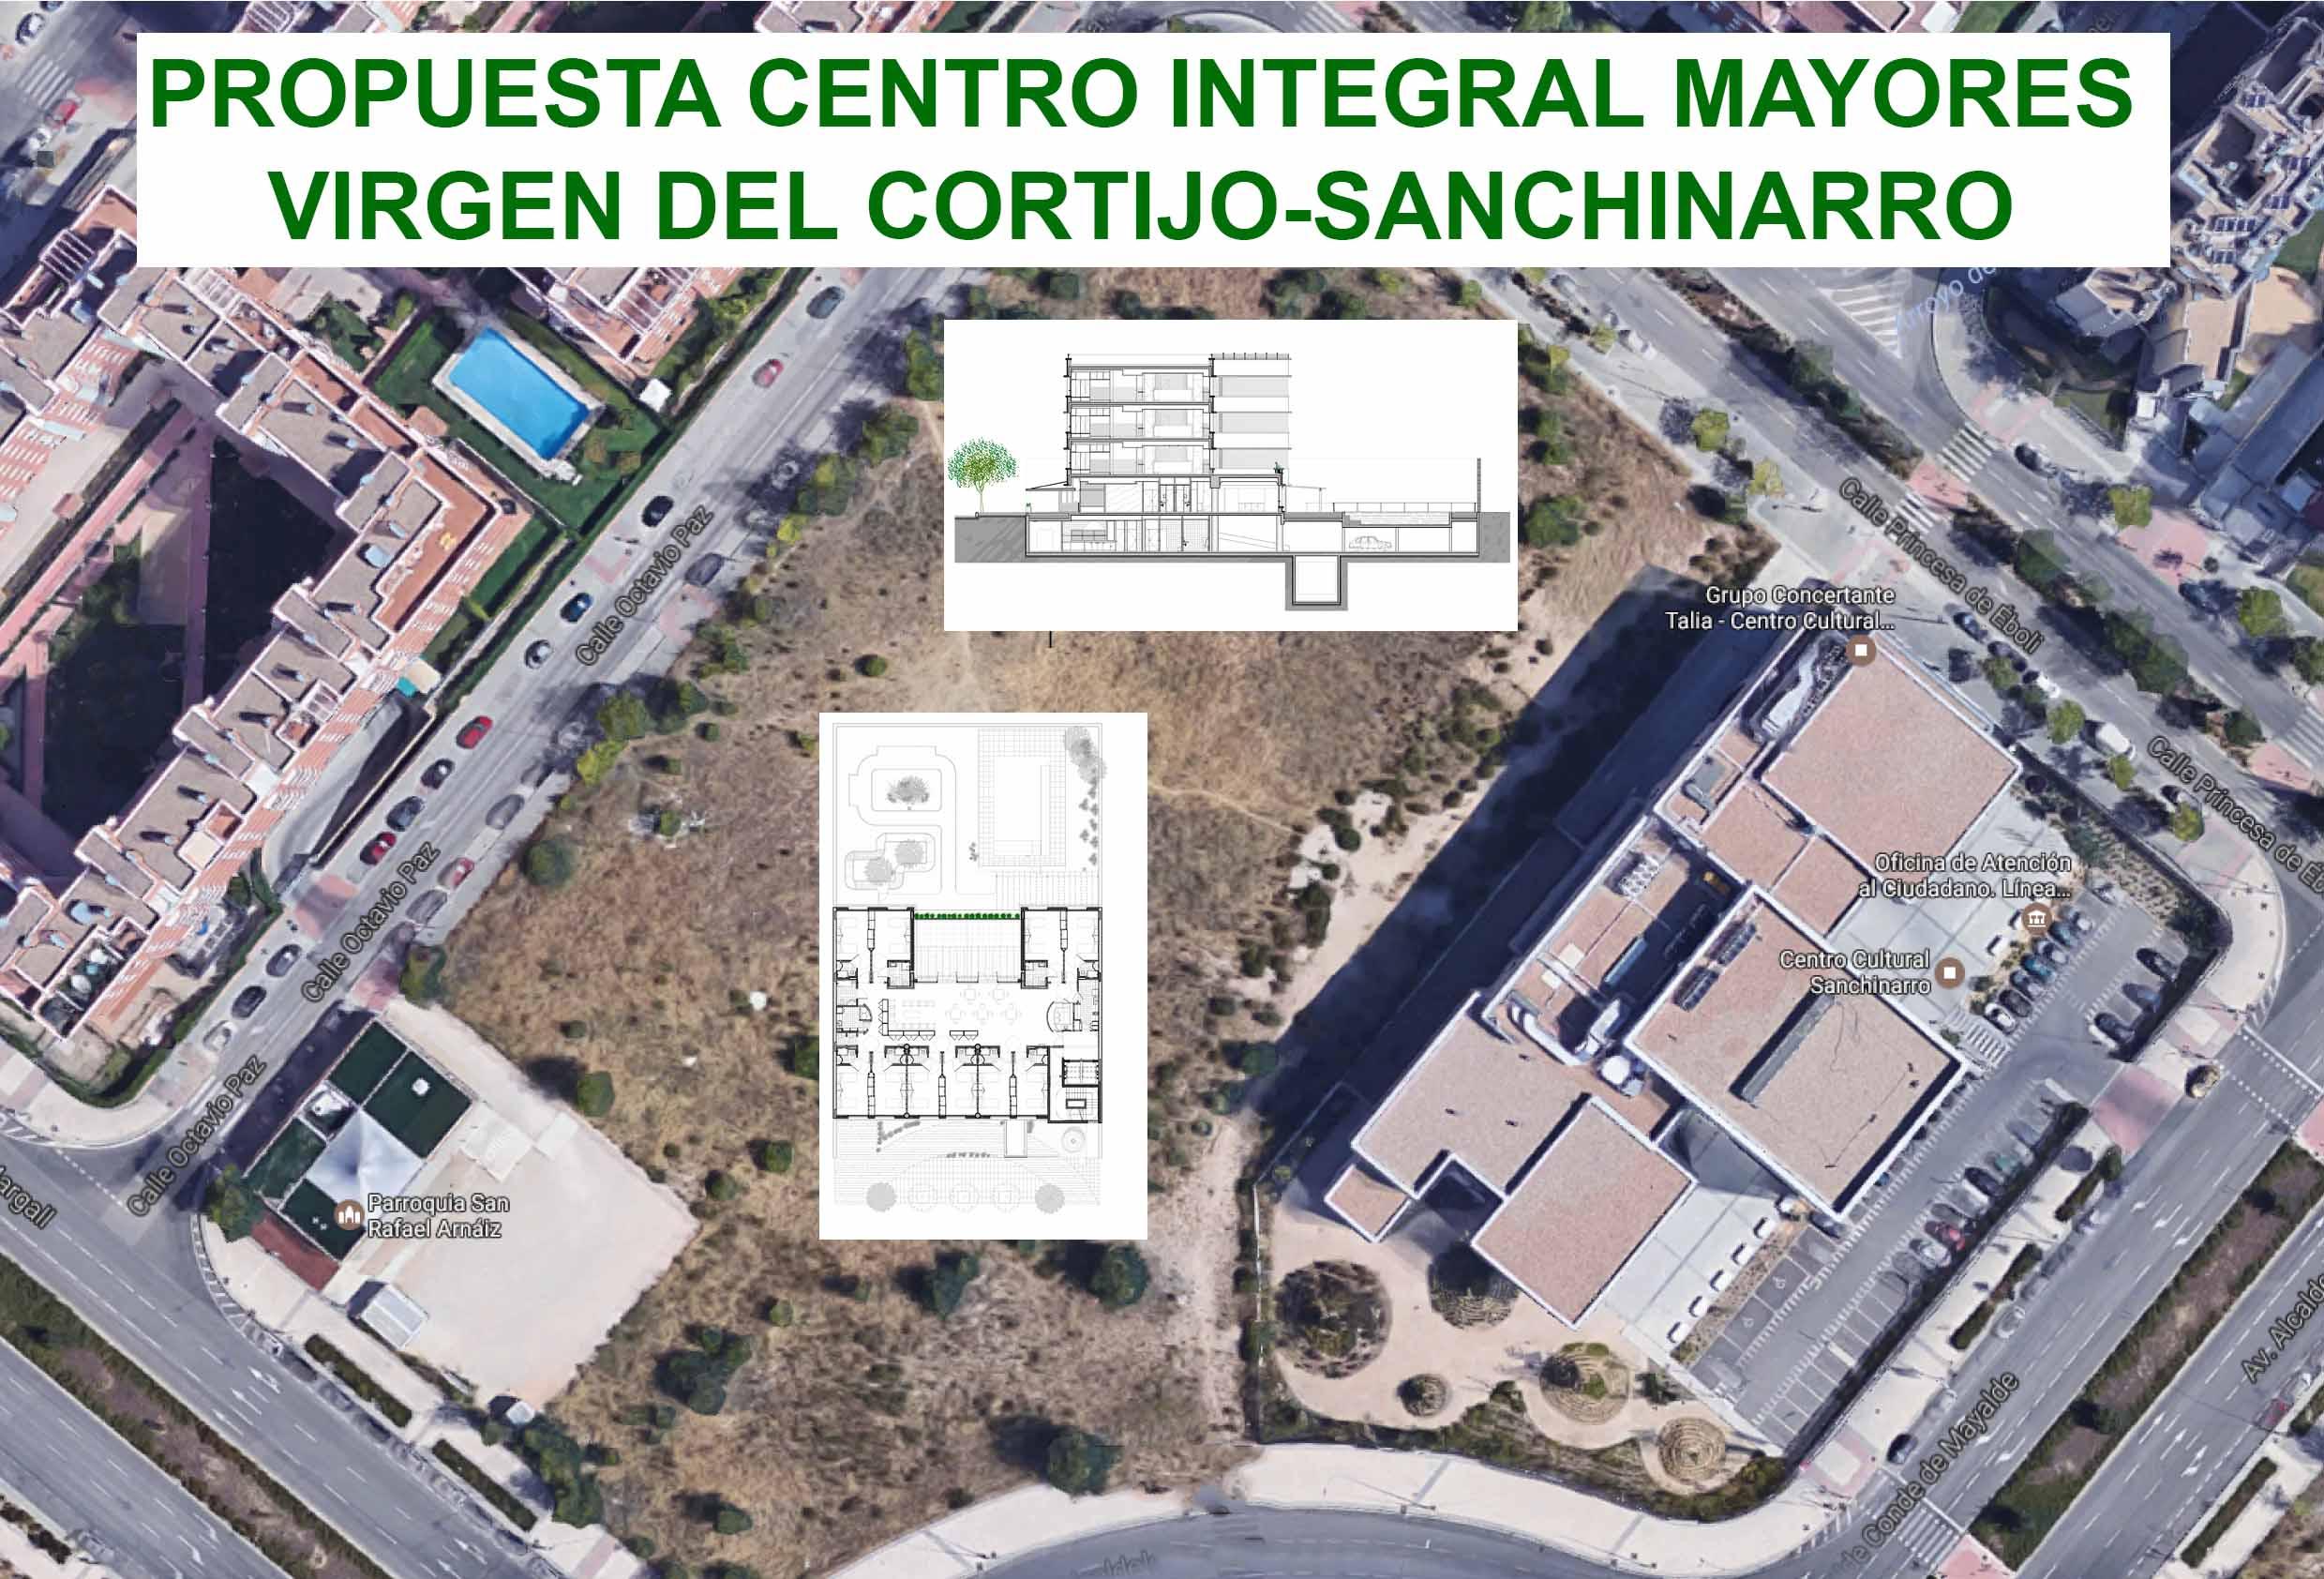 Layerslider_CentroIntegralMayores_16MAR2017